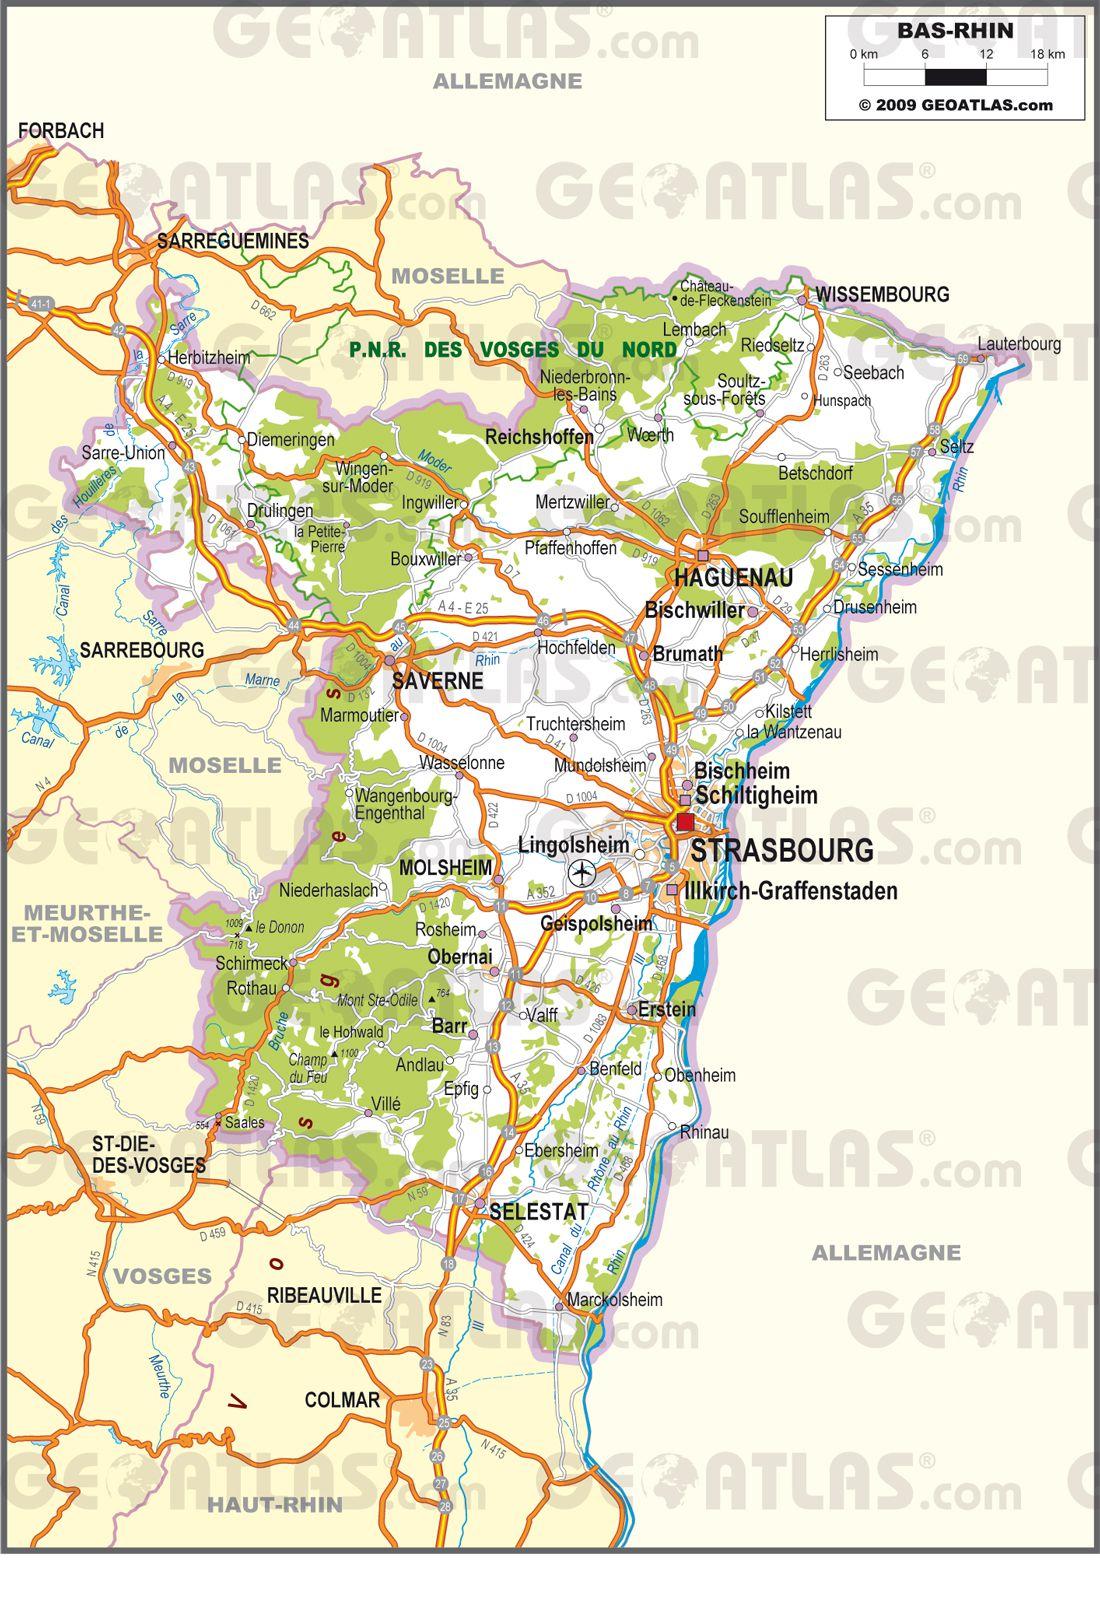 Carte routière du Bas-Rhin